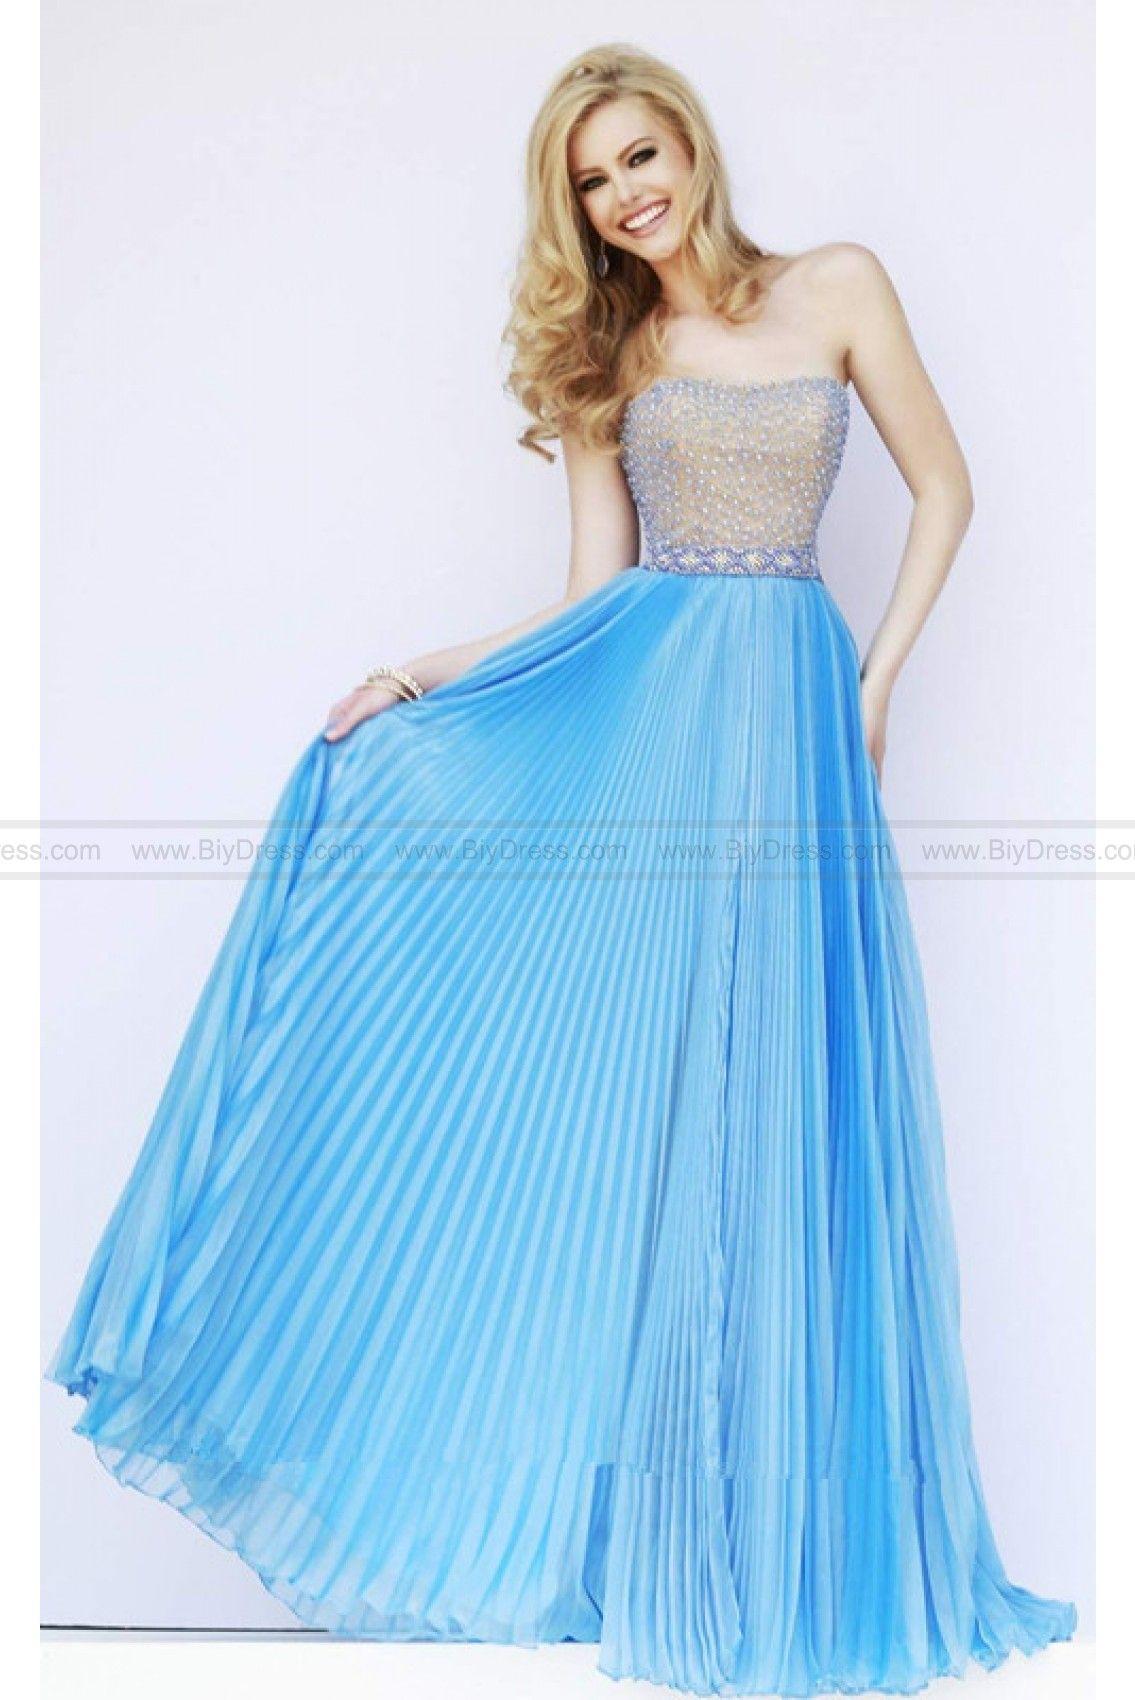 Sherri Hill 32143 - Prom Dresses 2016 - Special Occasion